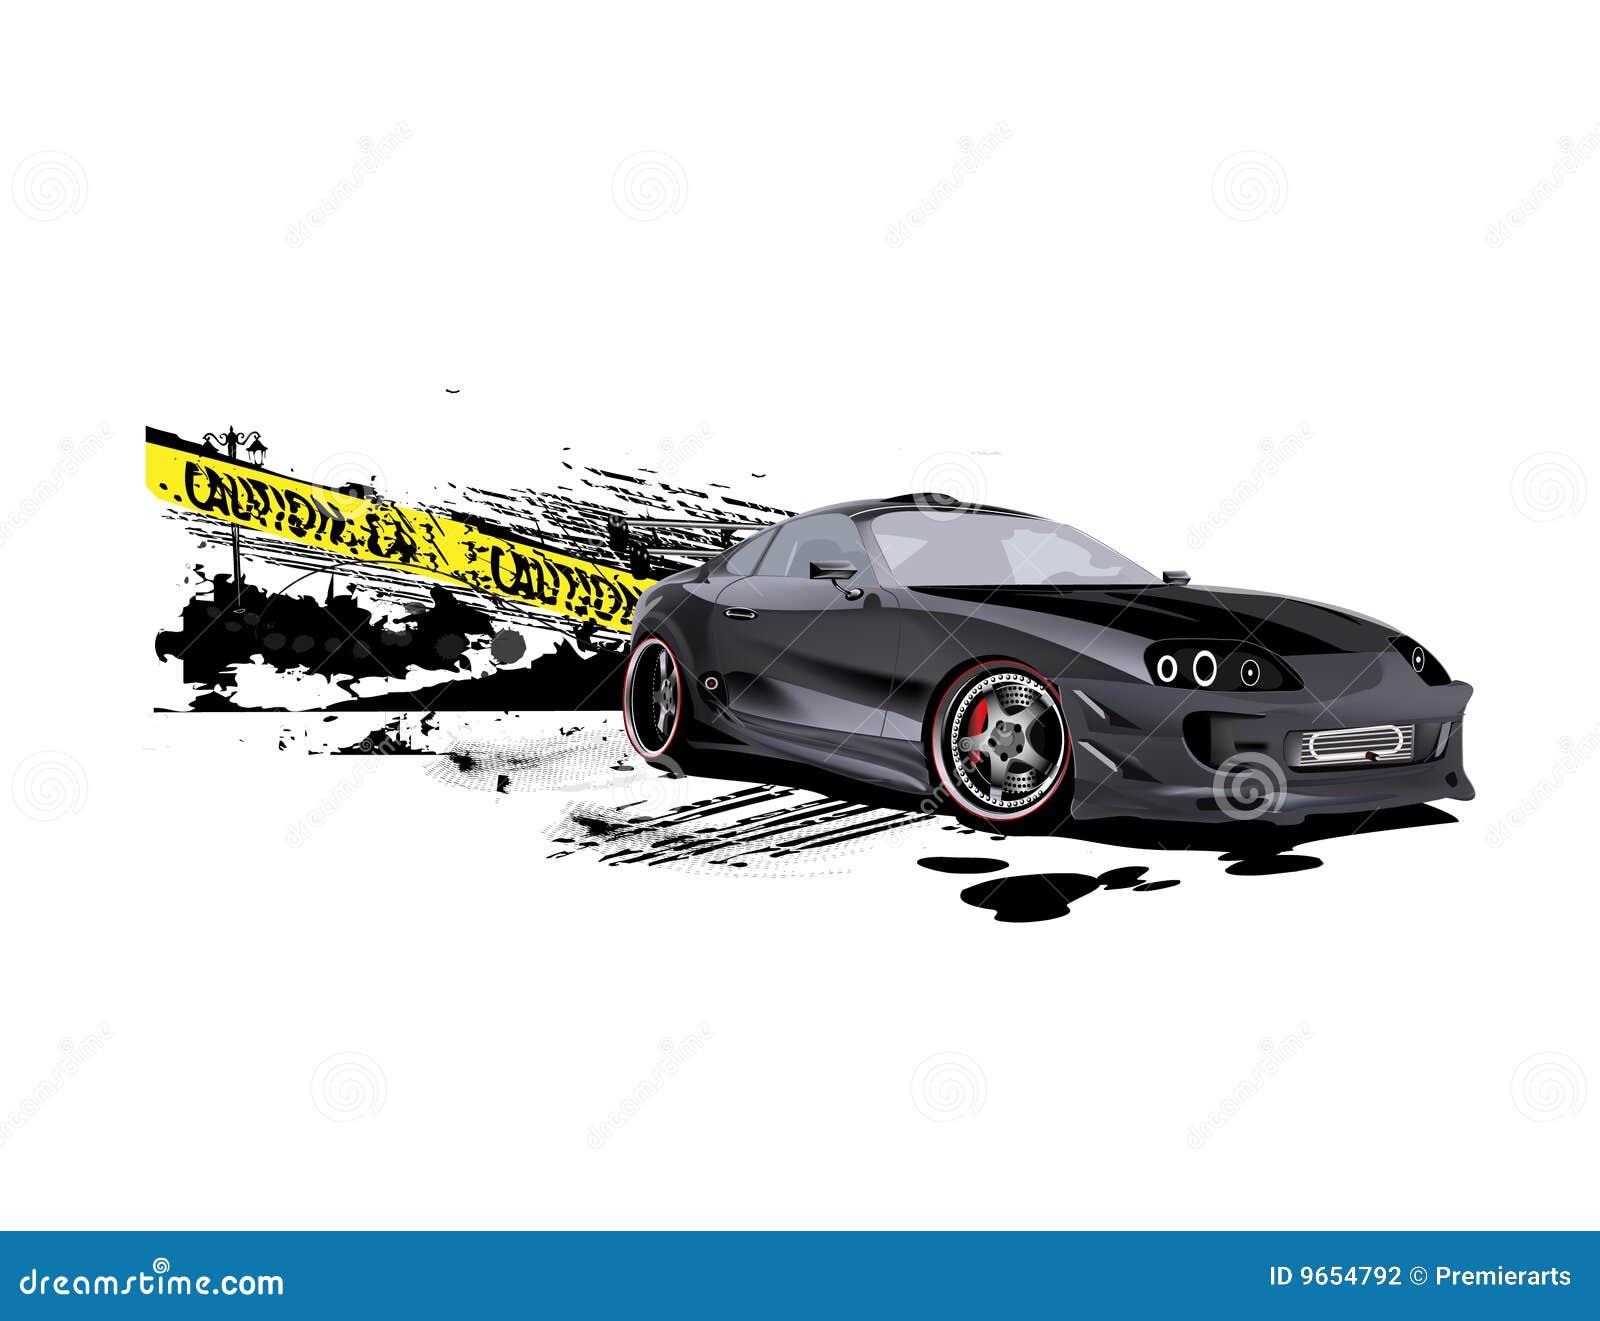 drifter cartoons  illustrations  u0026 vector stock images